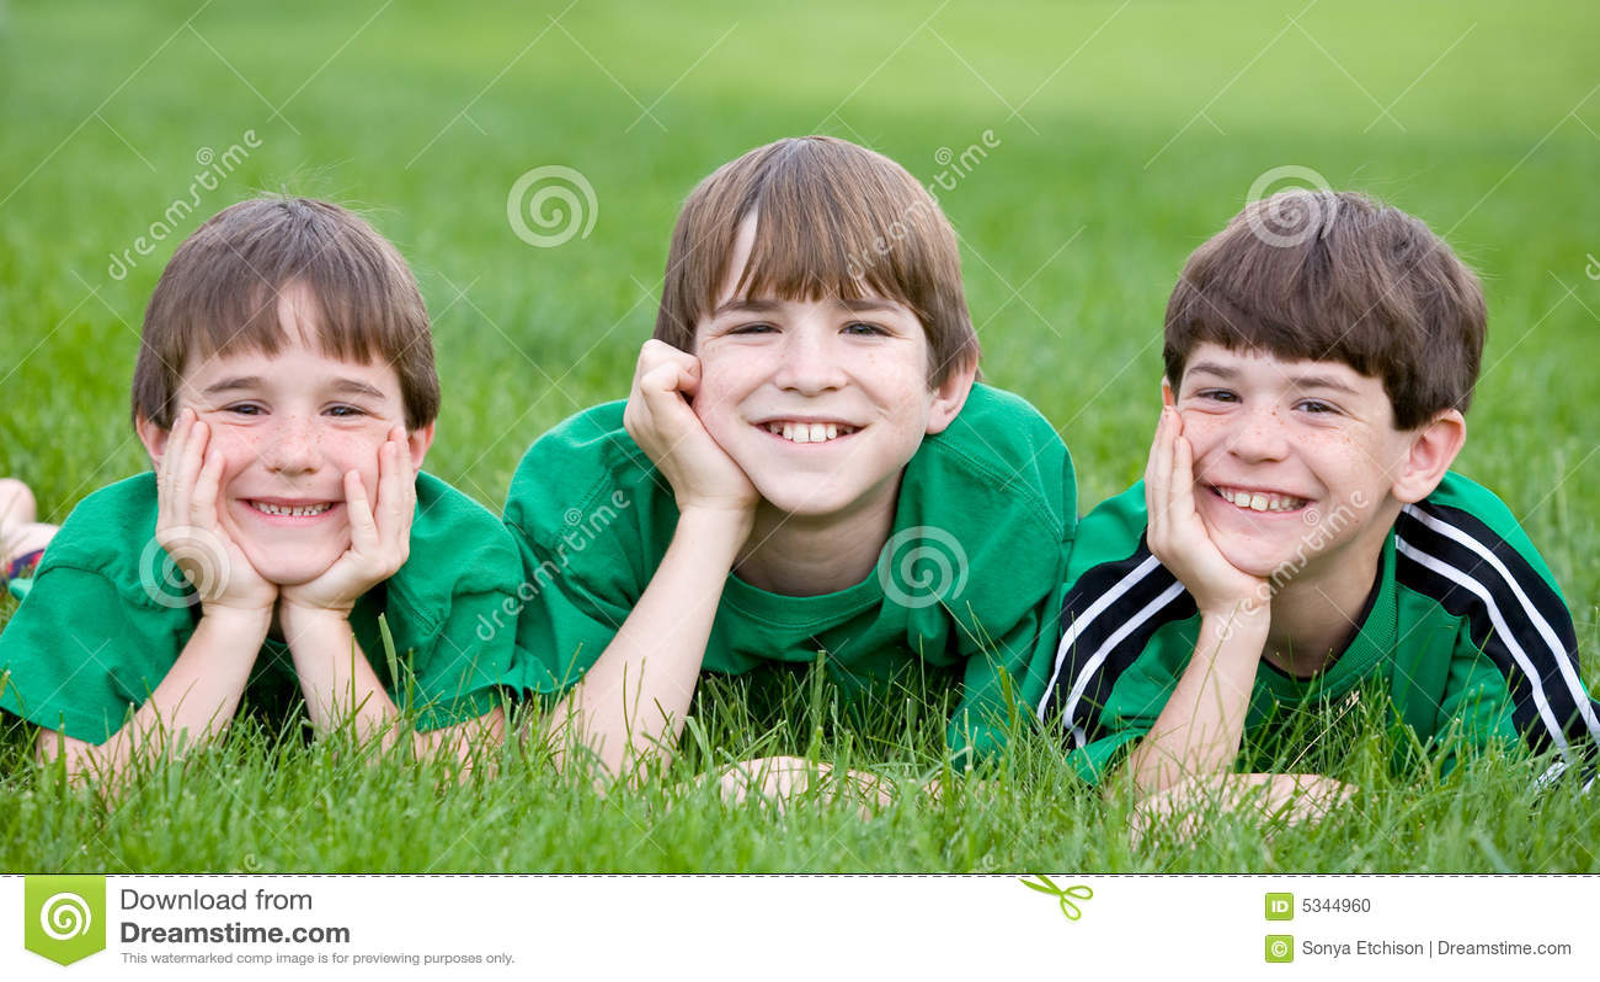 Brat zielony 3